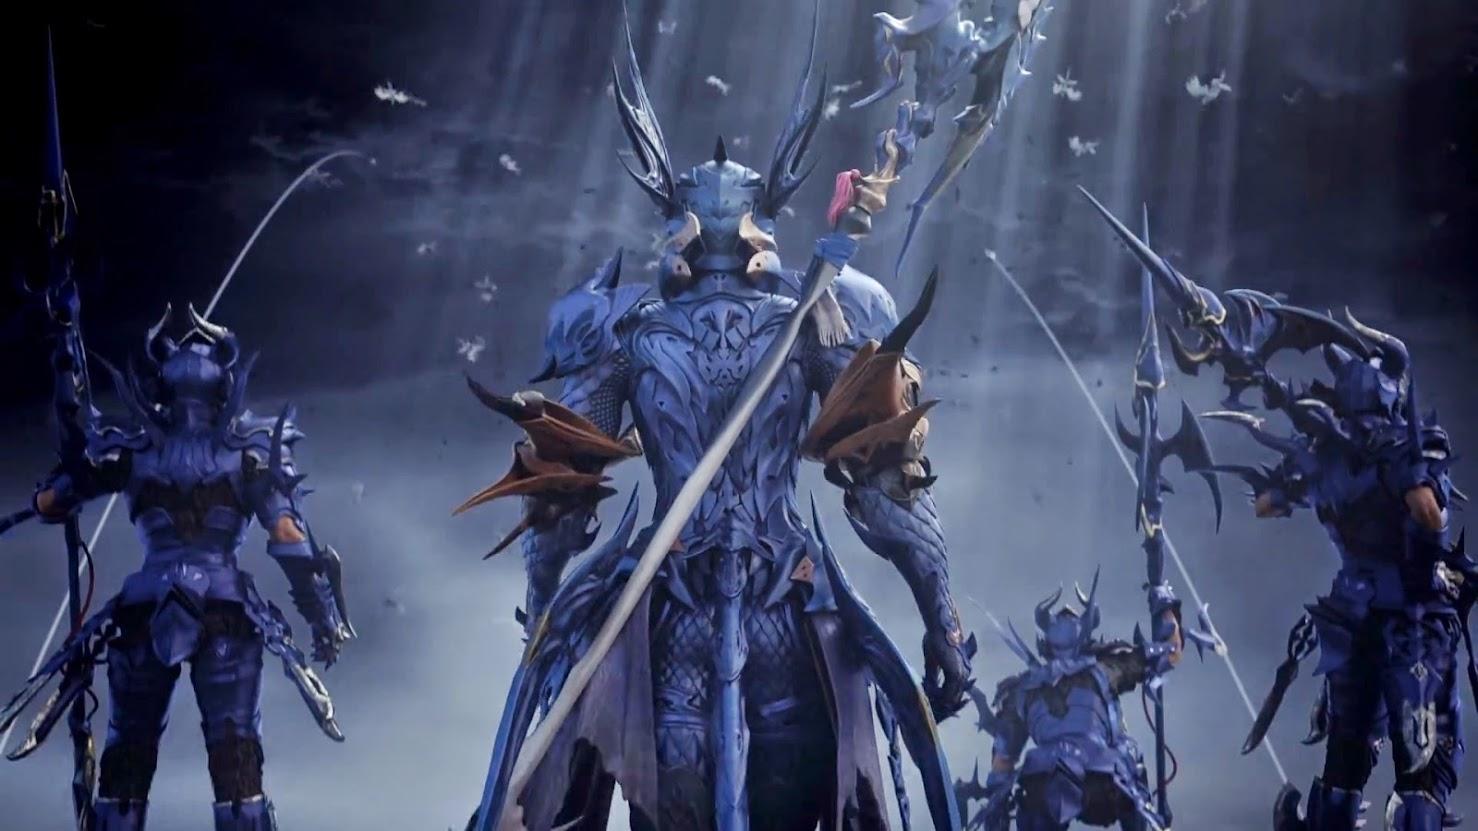 1432101136_Final Fantasy XIV Heavensward.jpg